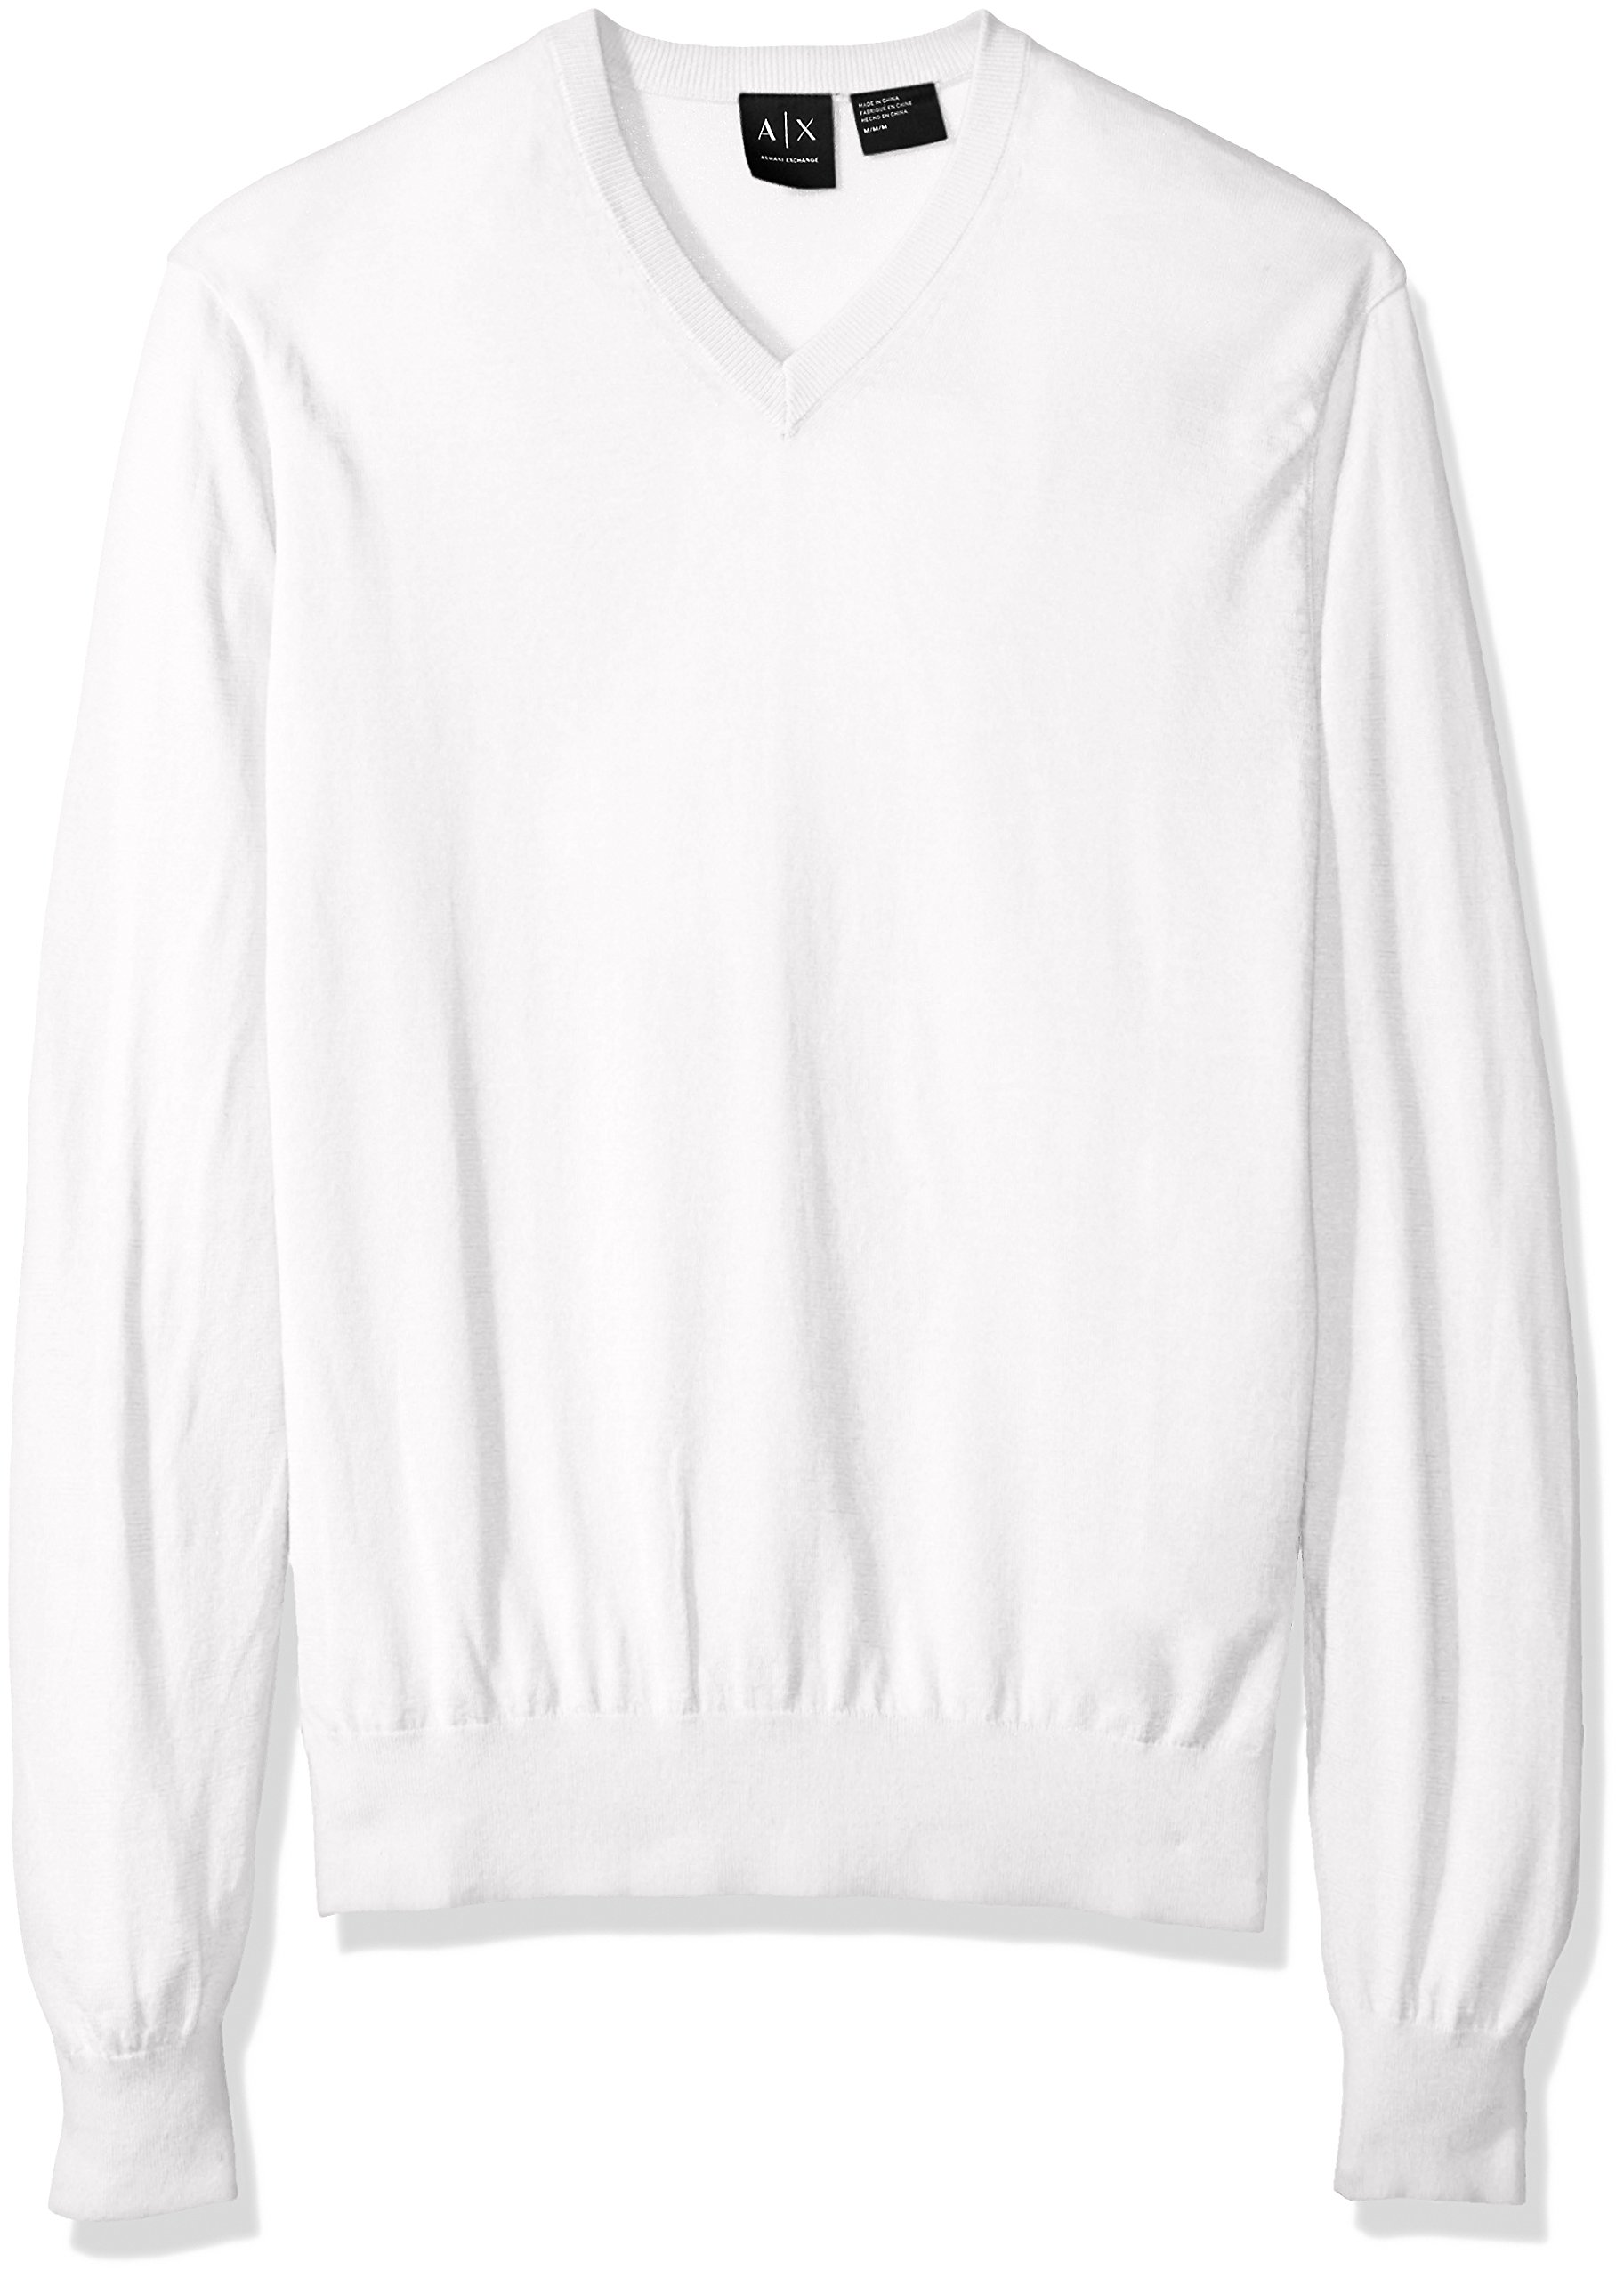 A|X Armani Exchange Men's Ls V Neck Sweater Knit, White, Medium